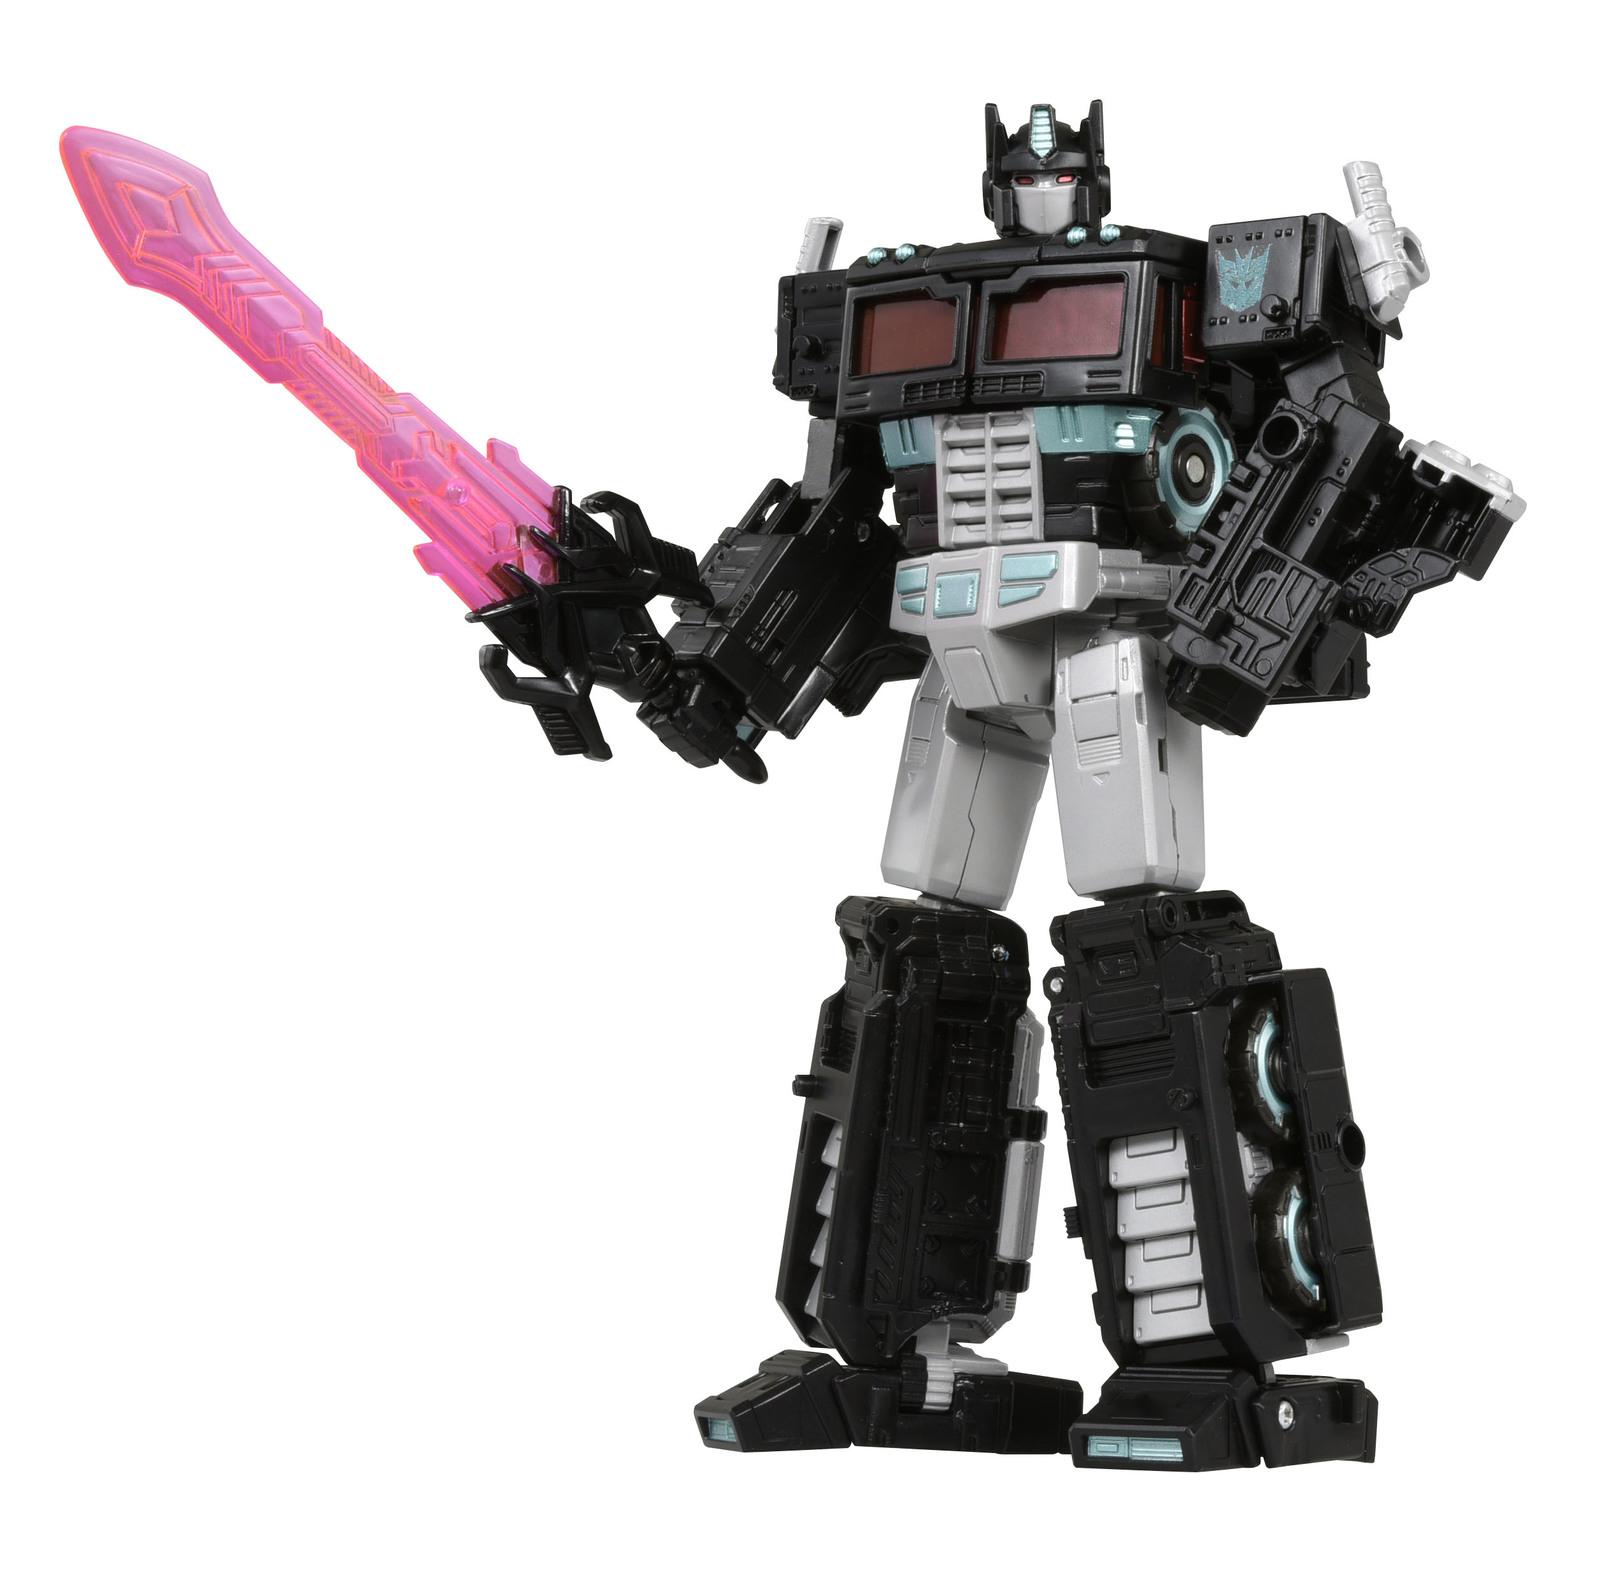 Transformers: War For Cybertron - SG-06 Nemesis Prime image